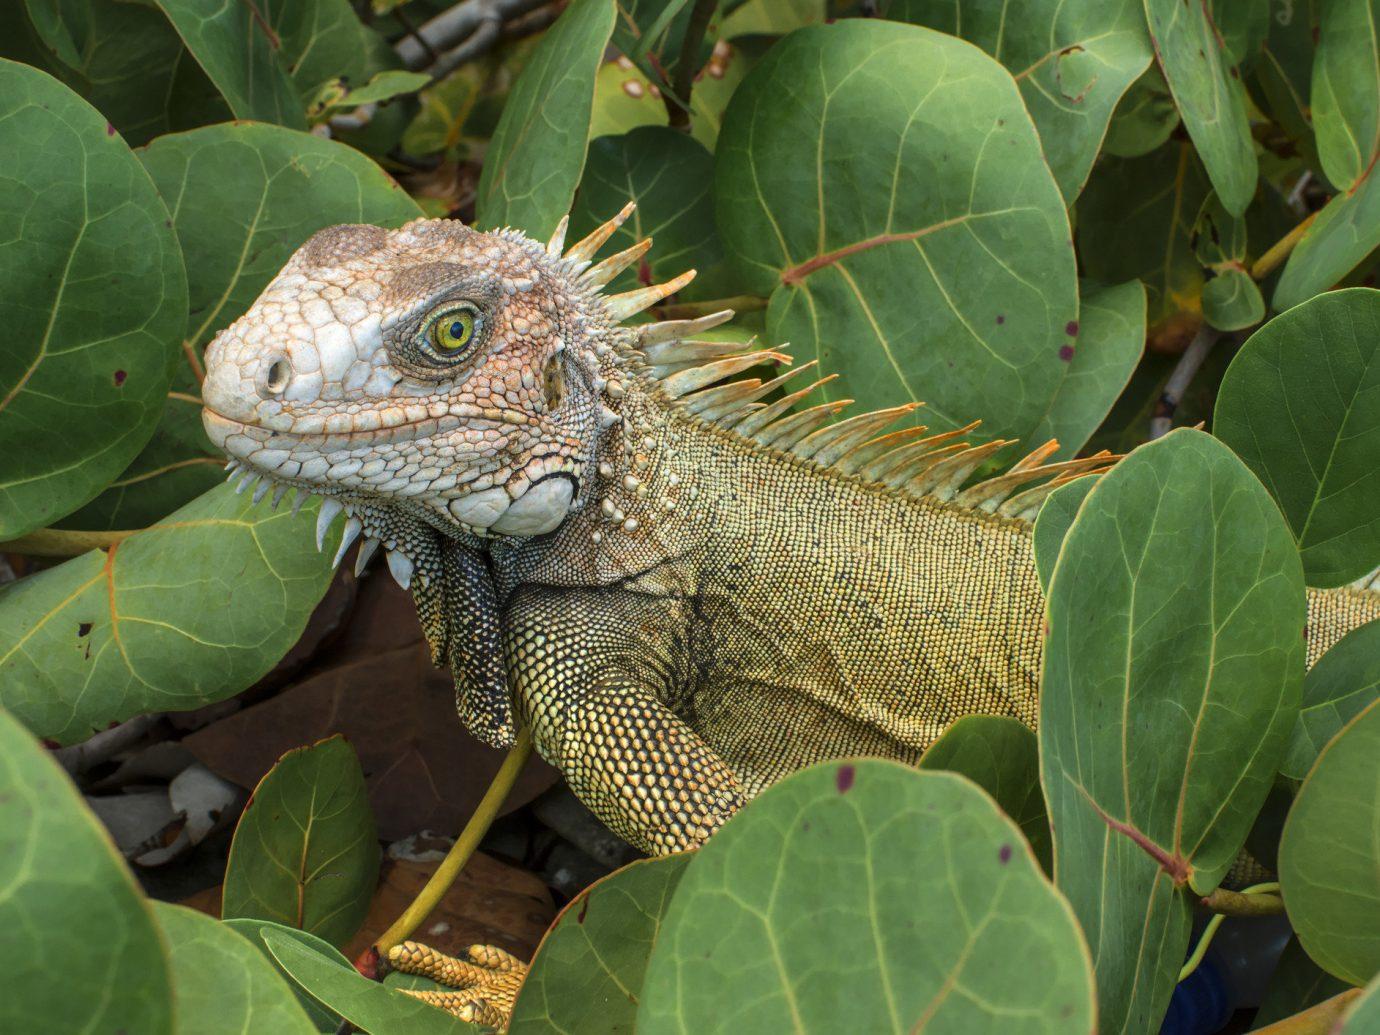 Beach Trip Ideas reptile plant animal outdoor lizard iguana vertebrate green iguania scaled reptile leaf fauna Wildlife chameleon botany african chameleon Jungle tropics tortoise rainforest emydidae Garden surrounded